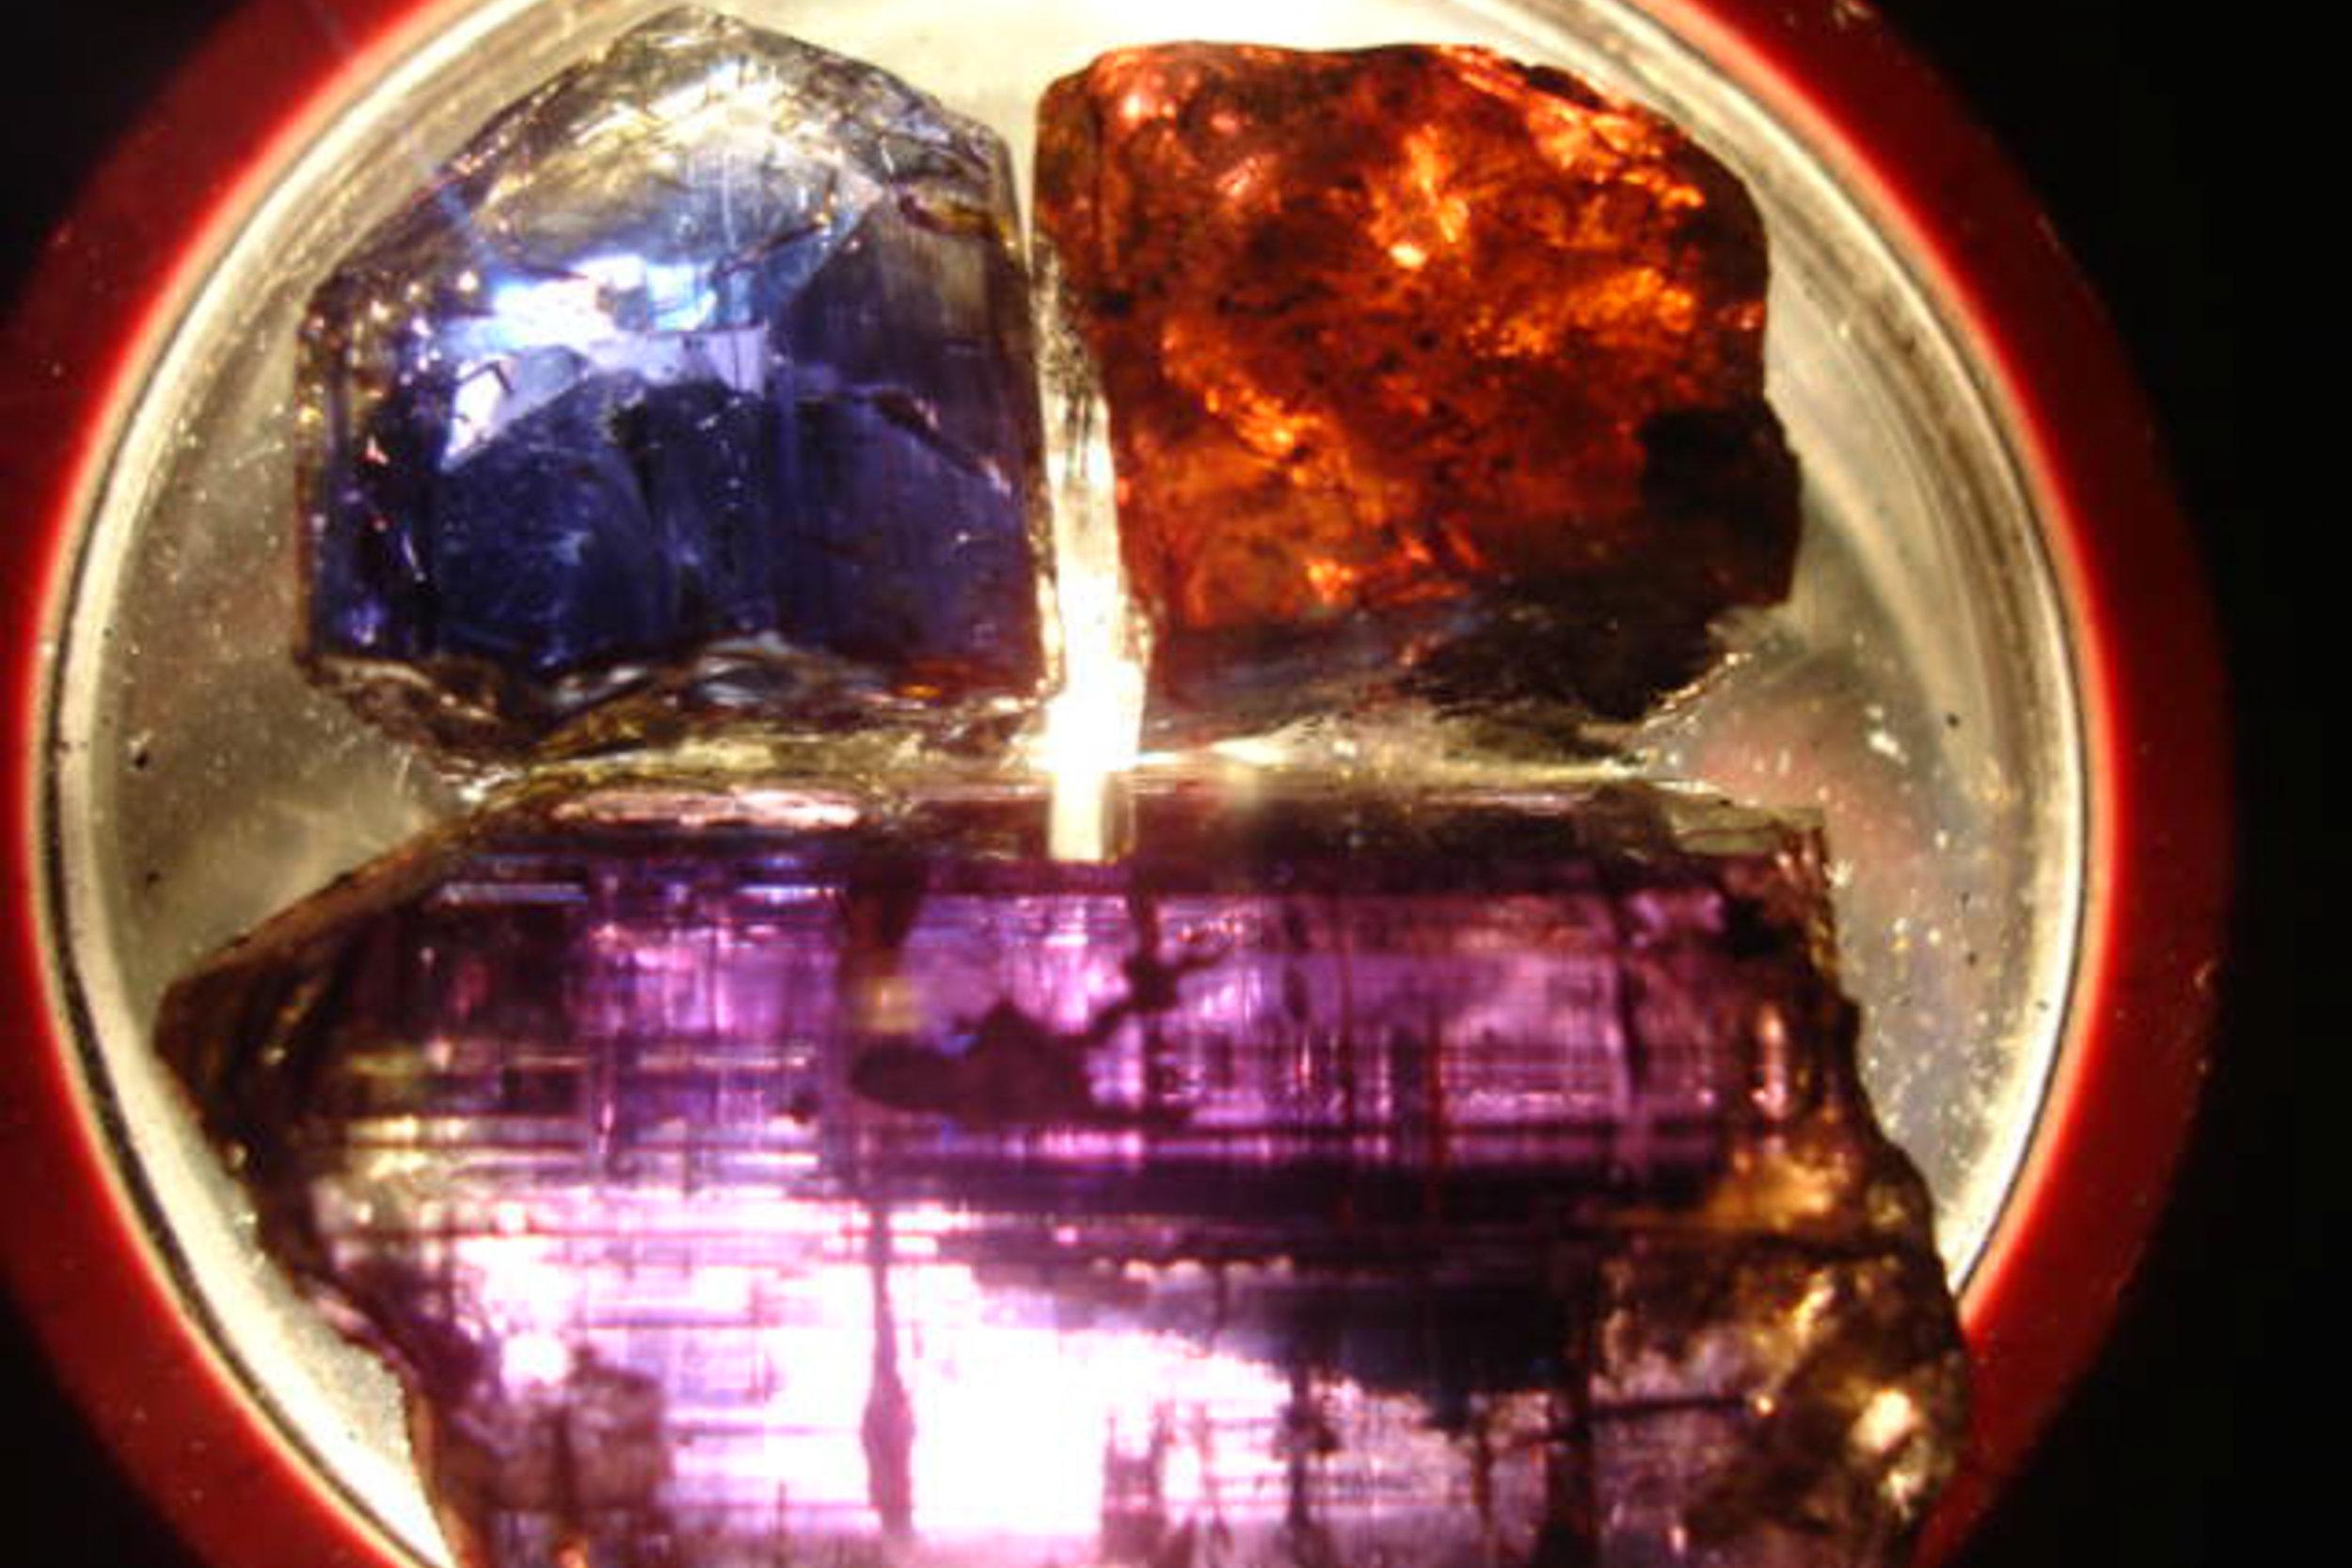 Natural trichroic tanzanite seen under incandescent lighting conditions.